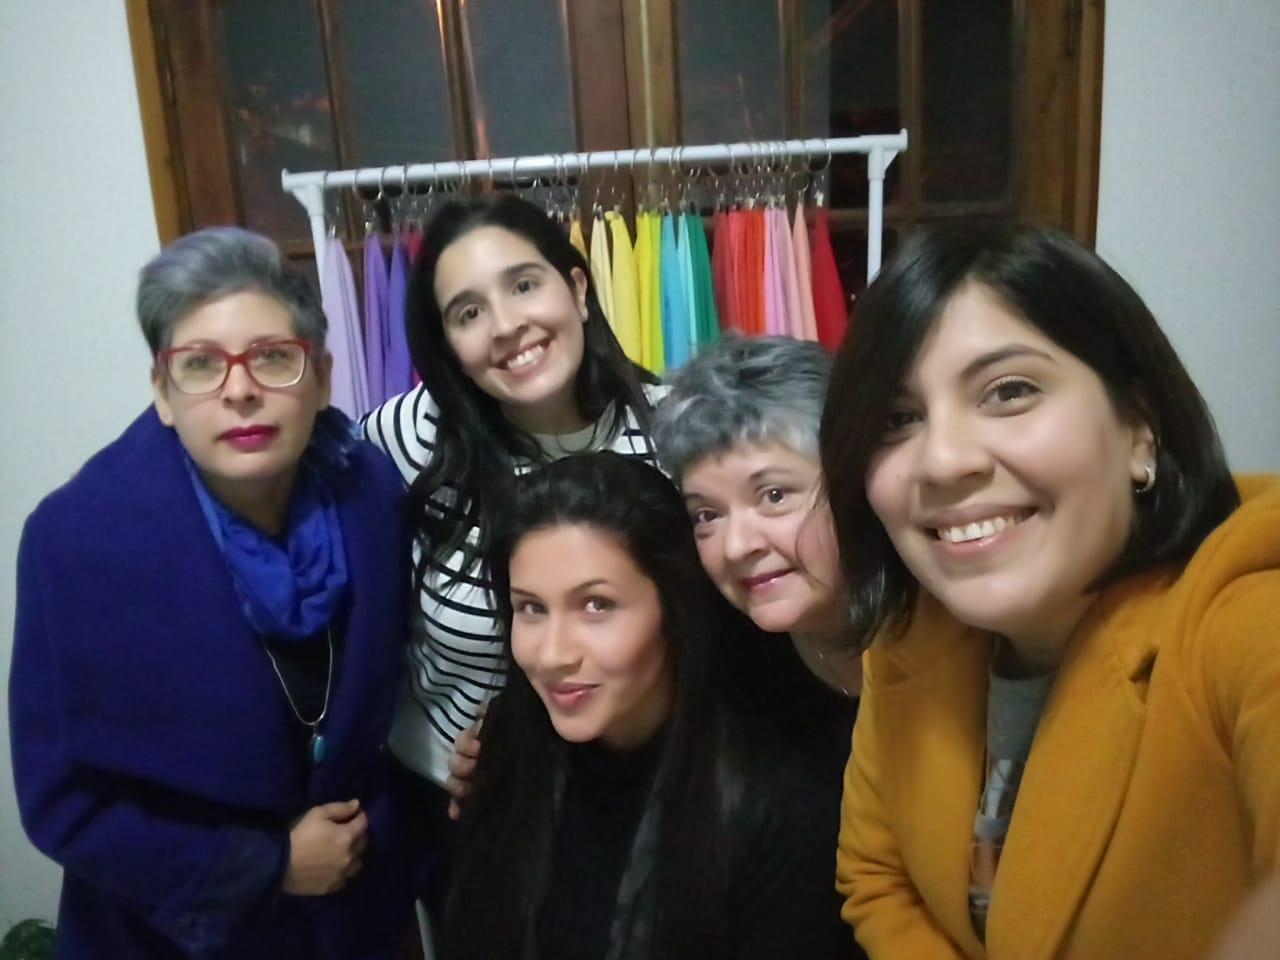 SoniaMcRorey Paraguay Mexico asesor asesoria personal shopper guardarropa color colorimetria rostro buenos negocios